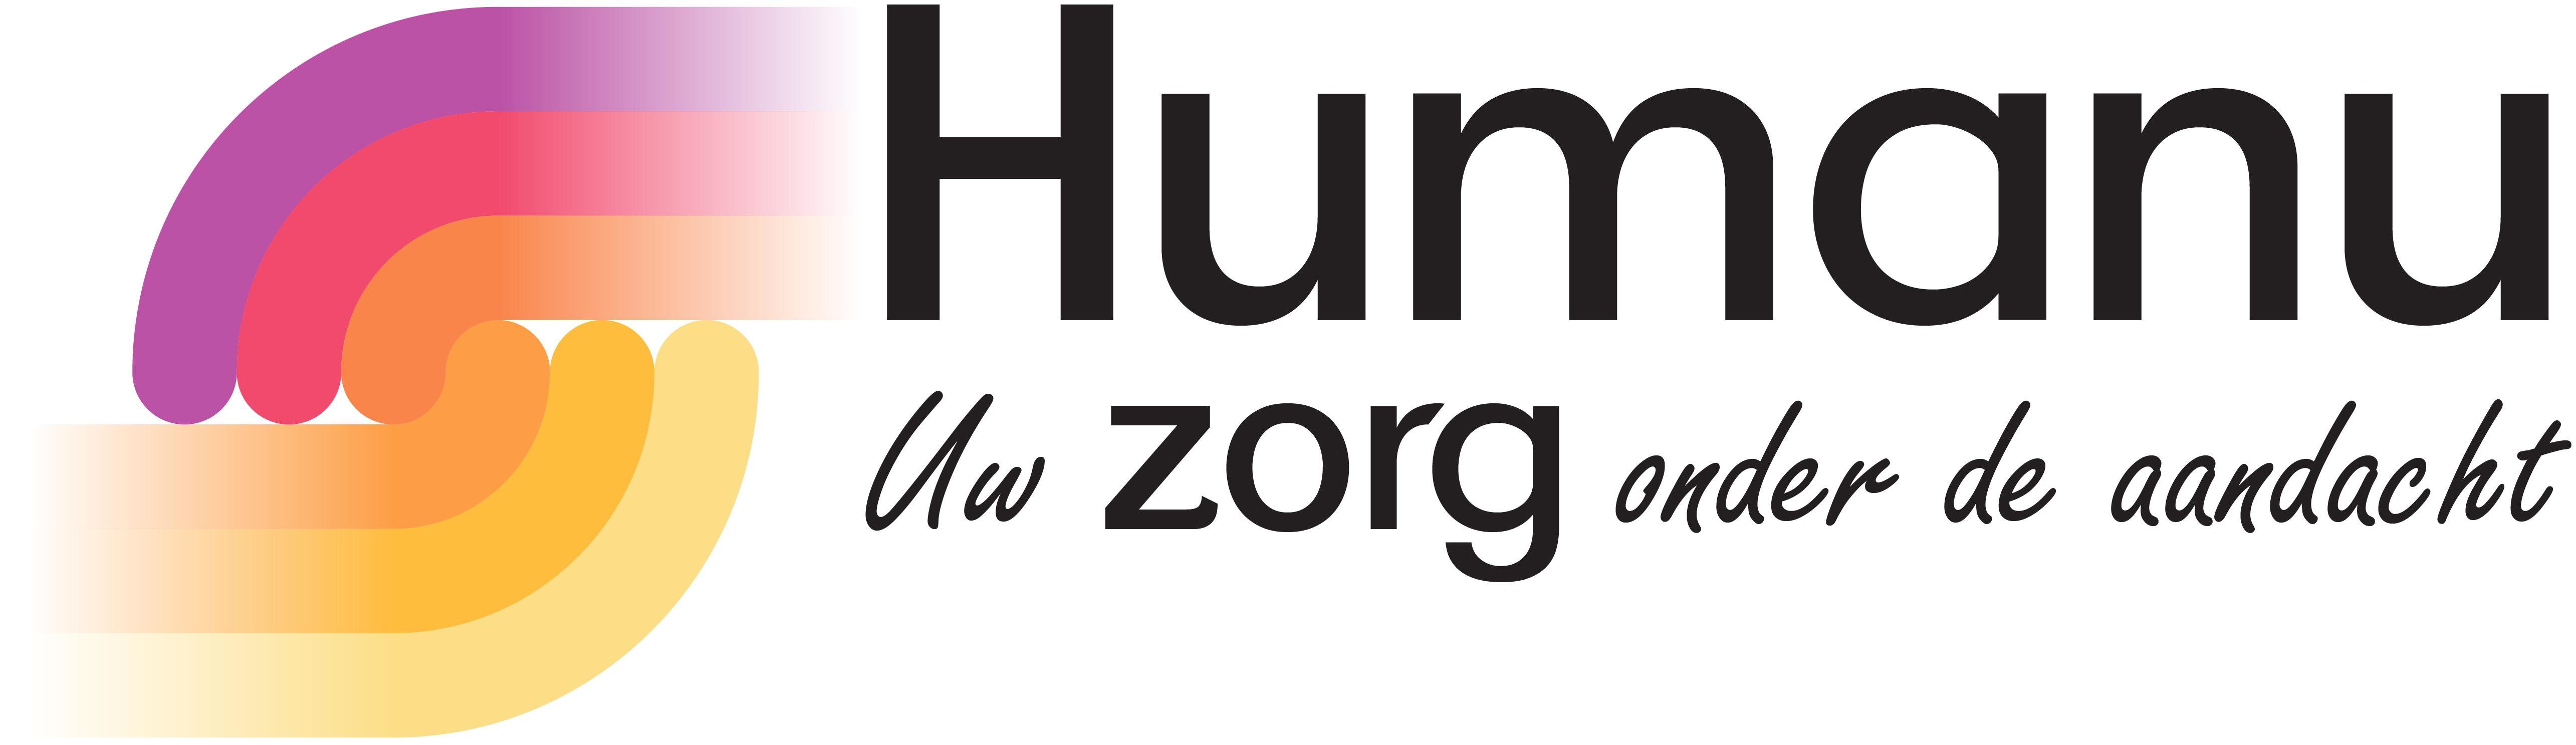 Humanu Zorg